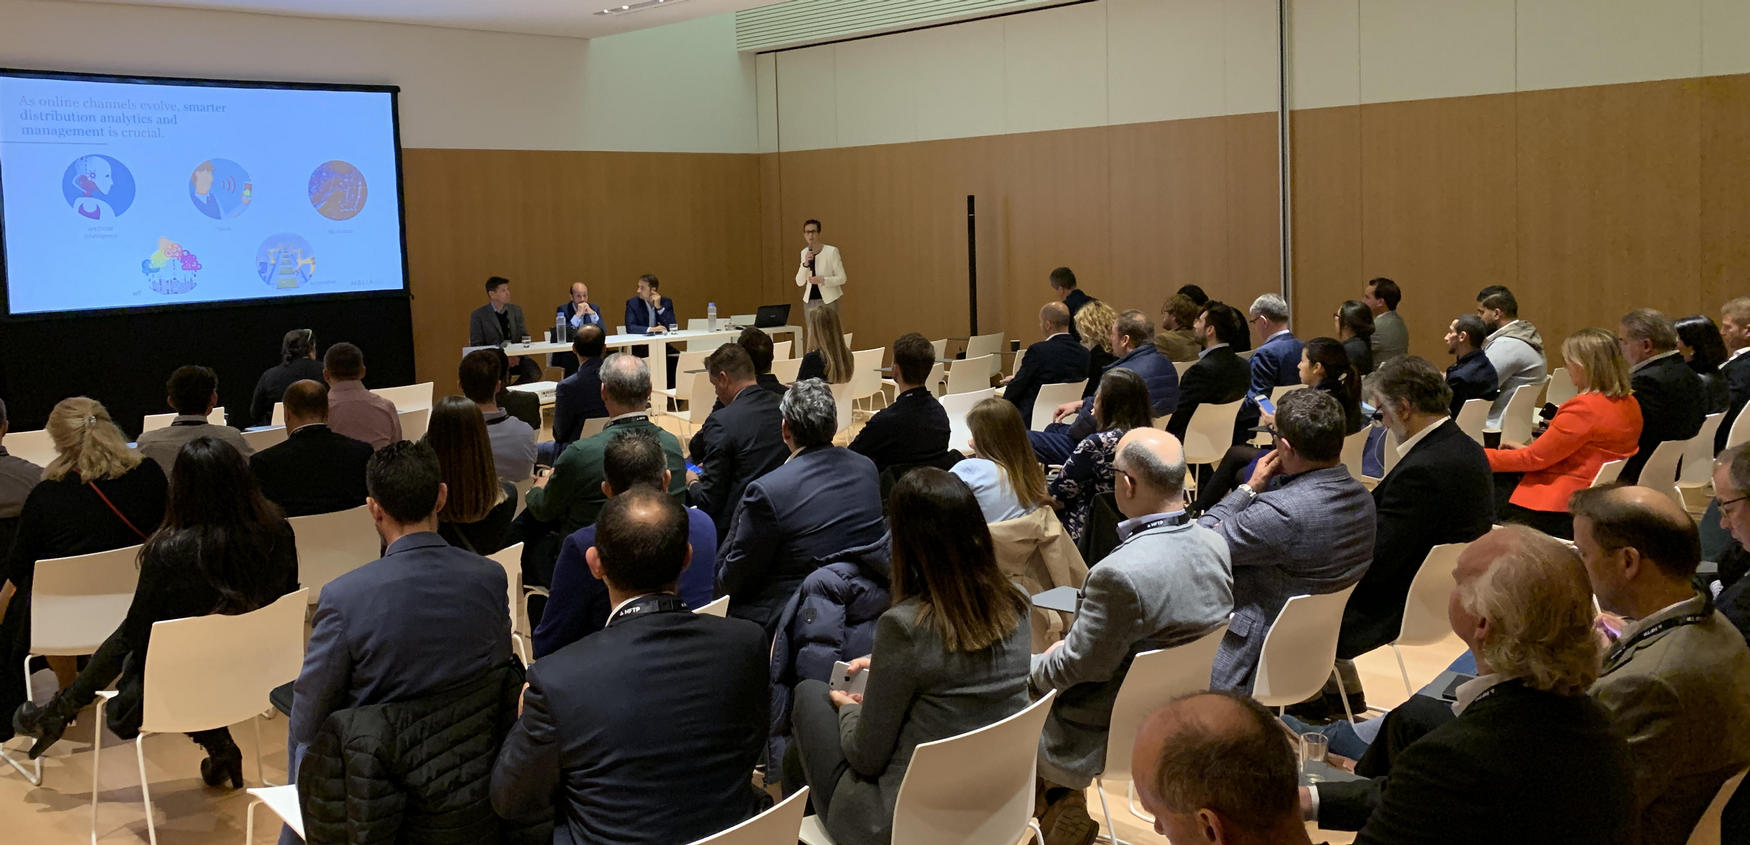 HITEC Europe Speakers | Mallorca Spain 2020 | HFTP Conferences